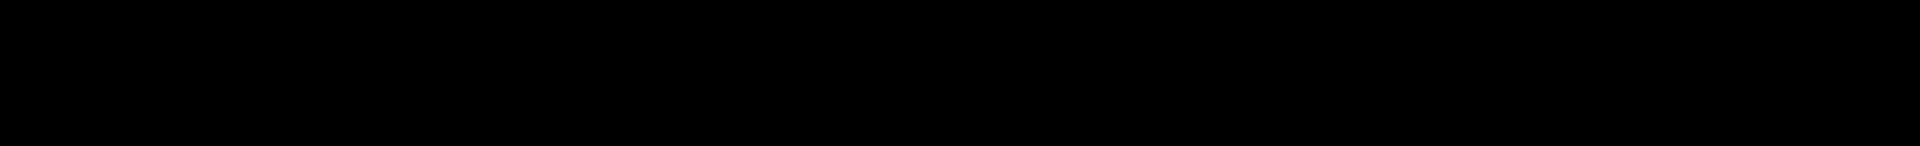 Graychenier